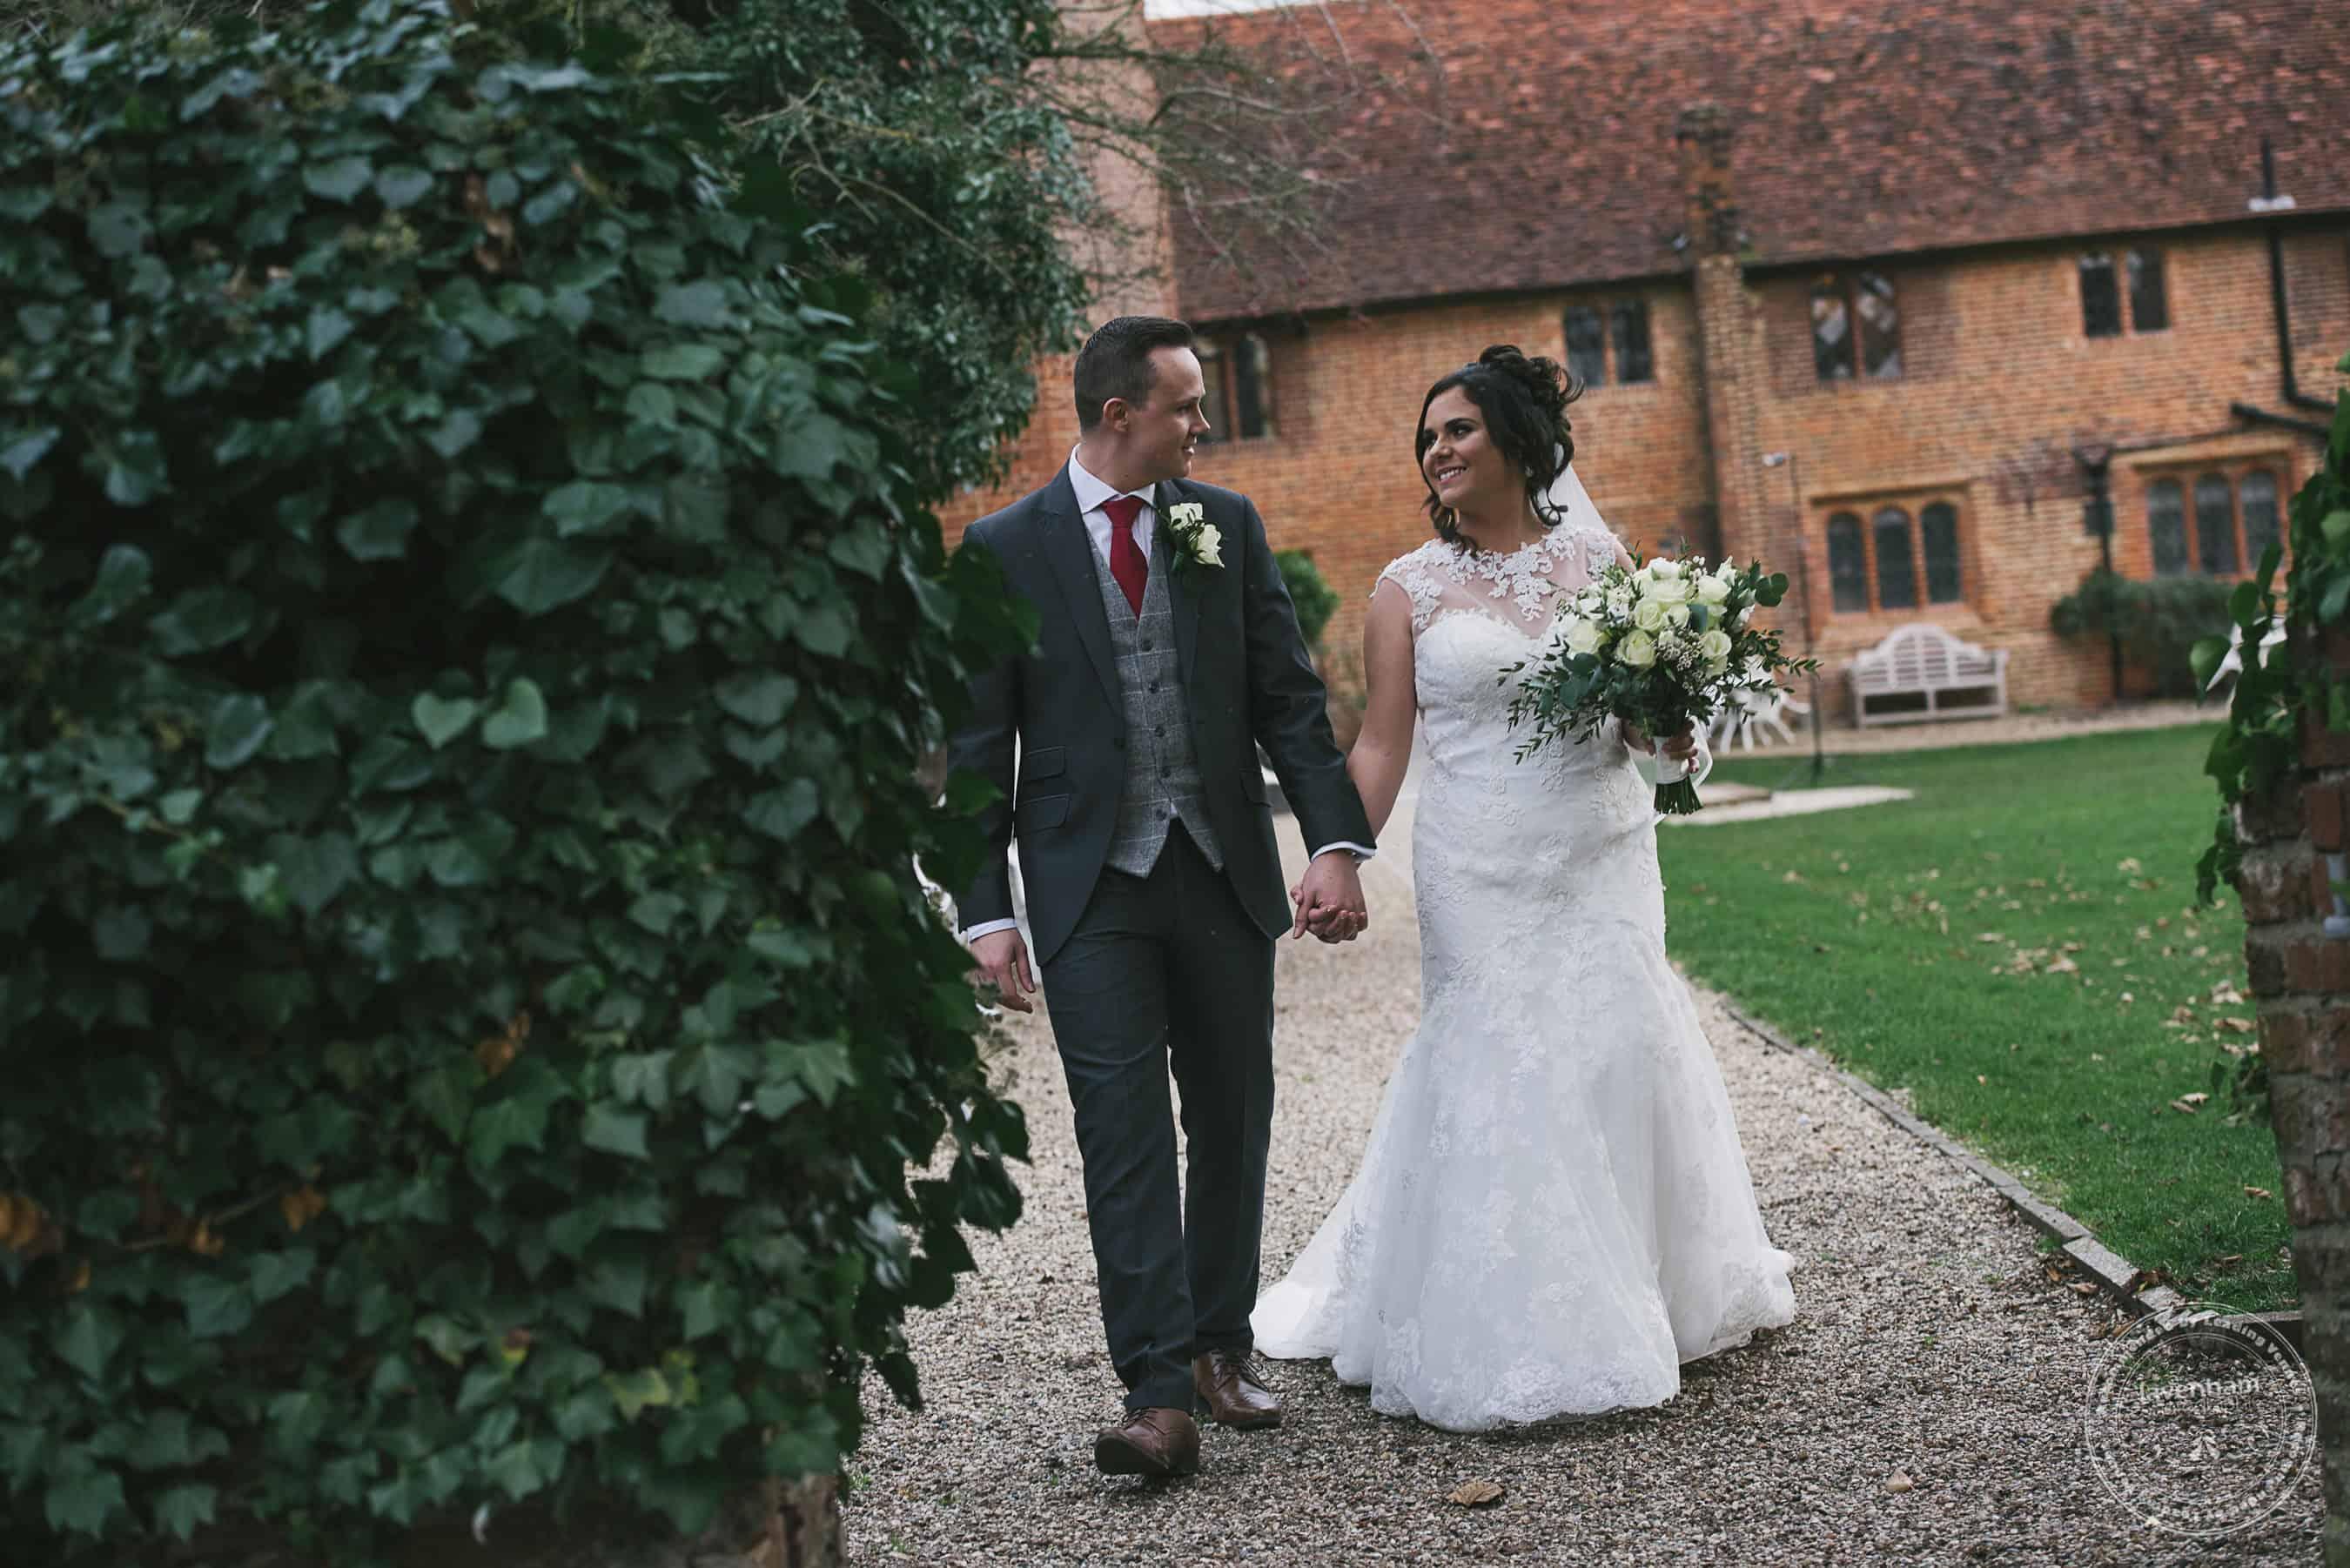 251118 Leez Priory Wedding Photography by Lavenham Photographic 079